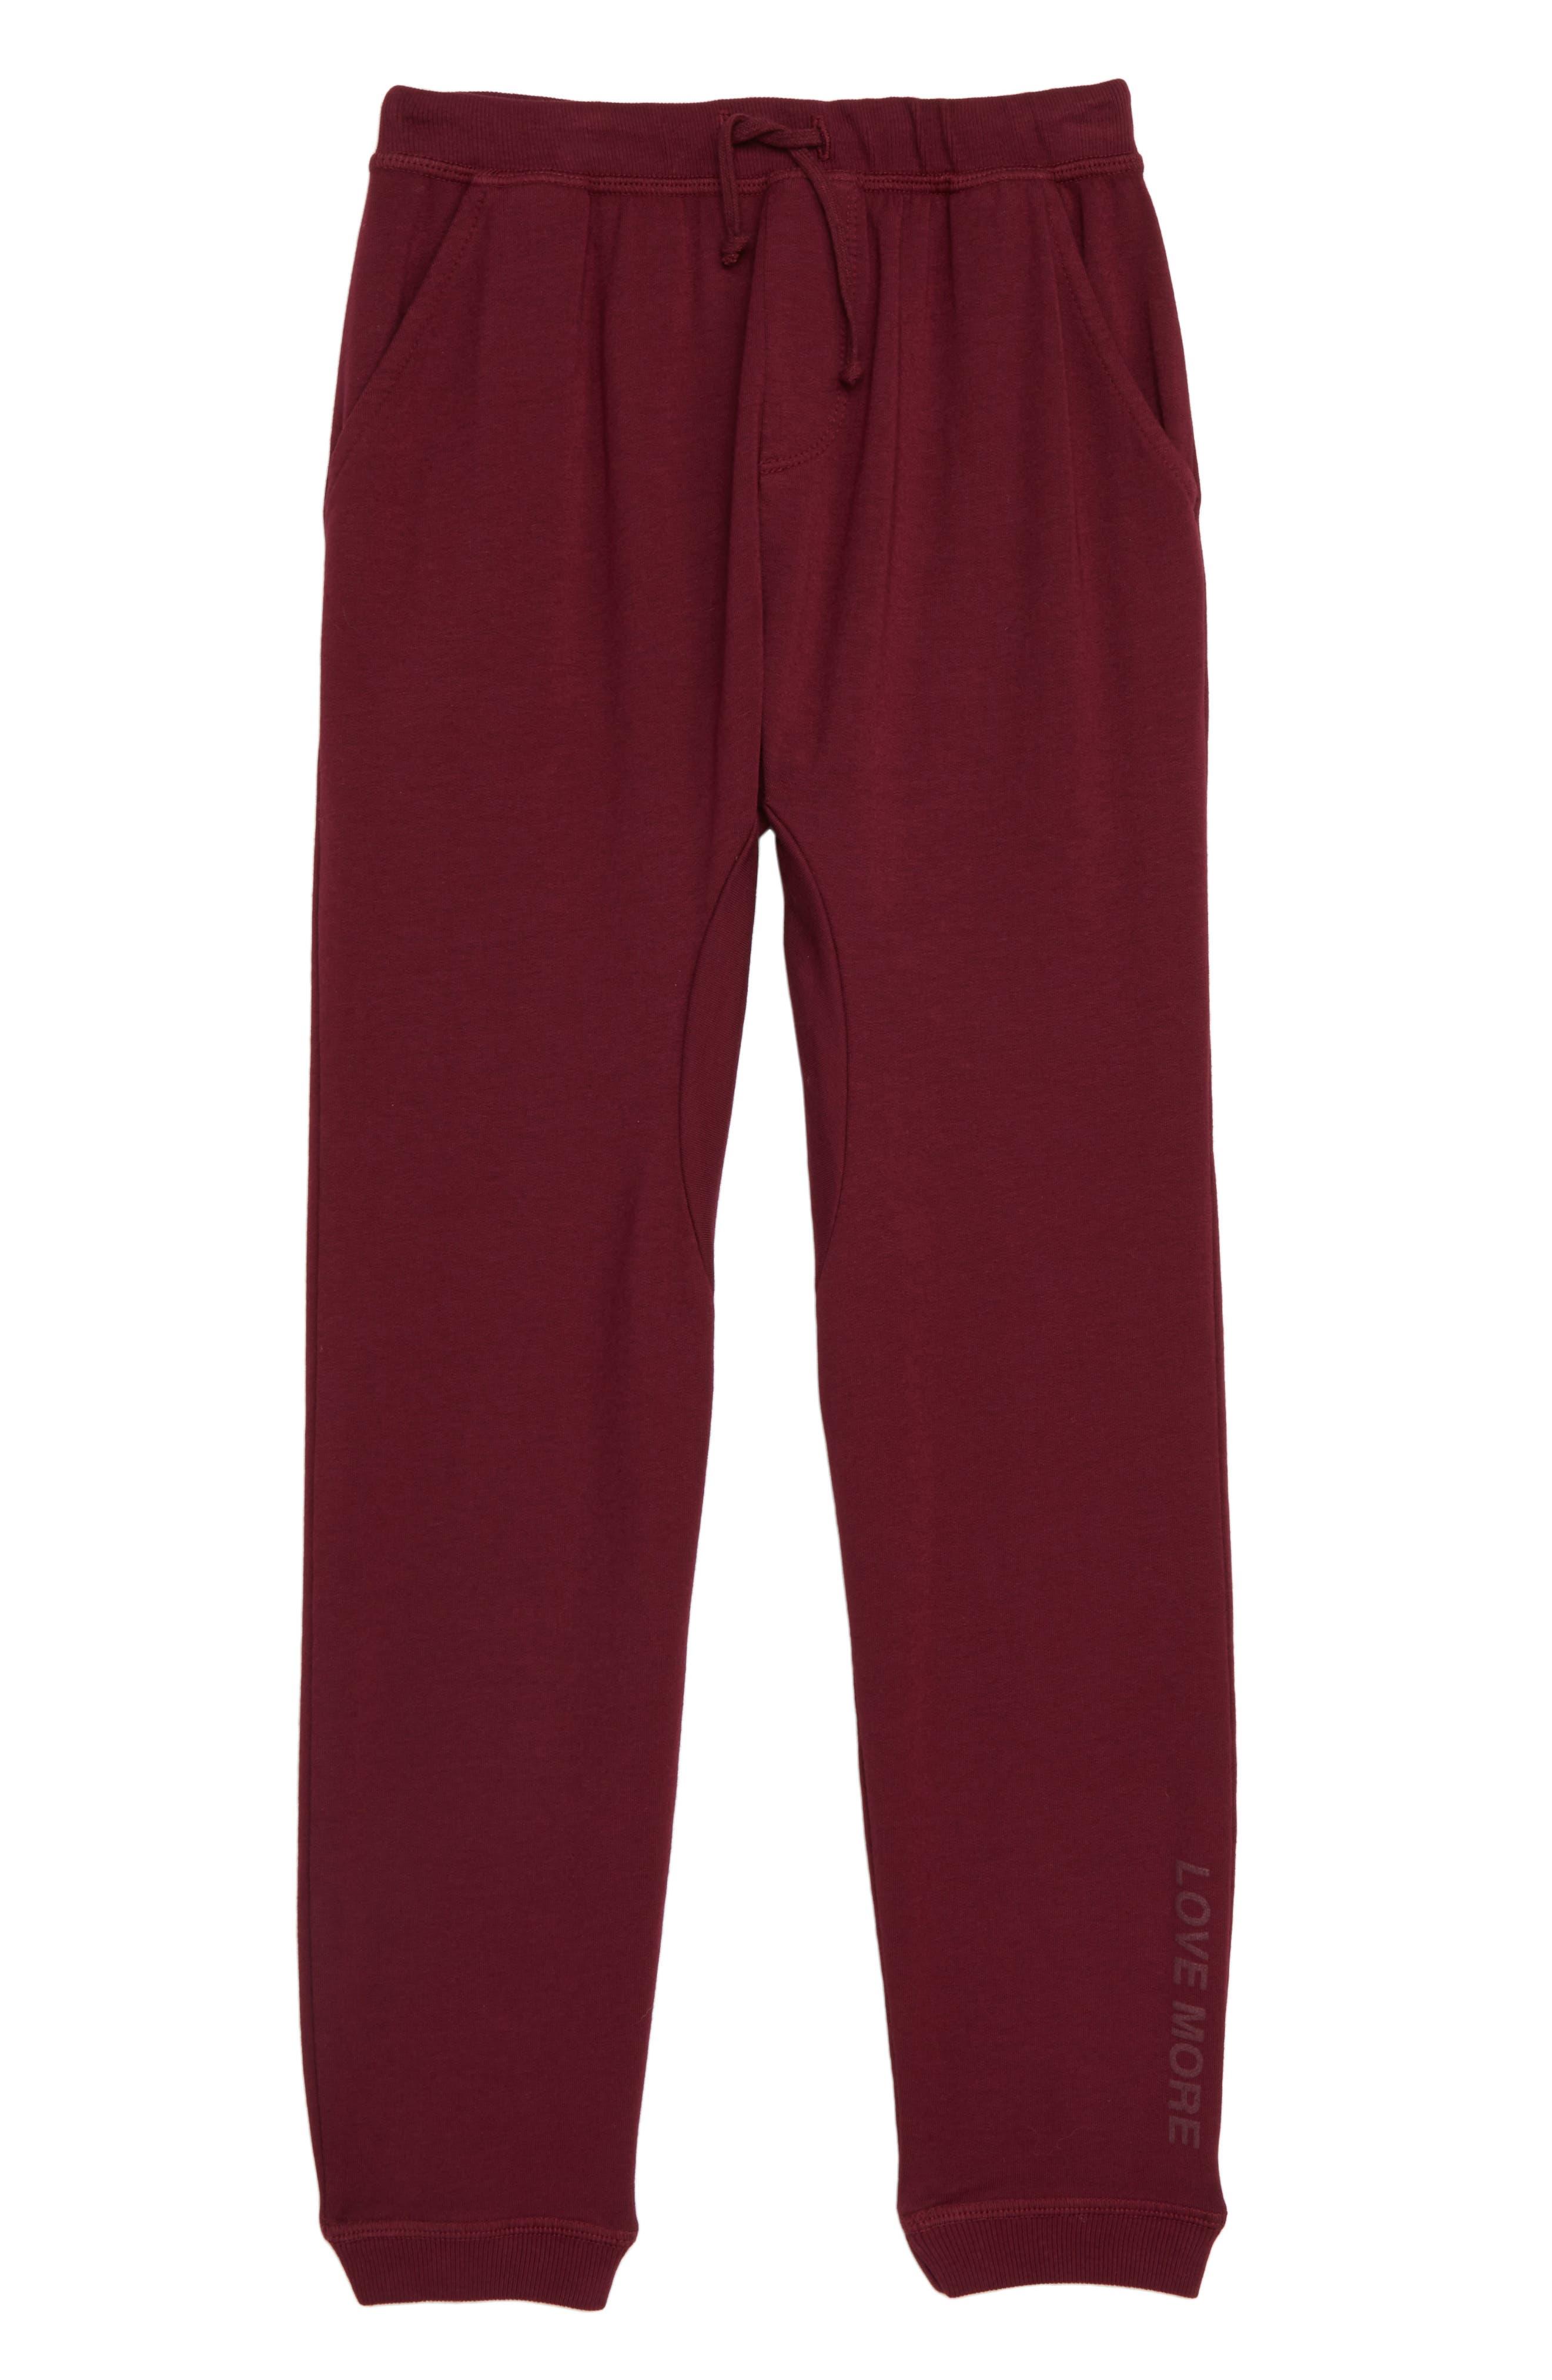 Love Jogger Pants,                         Main,                         color, 616